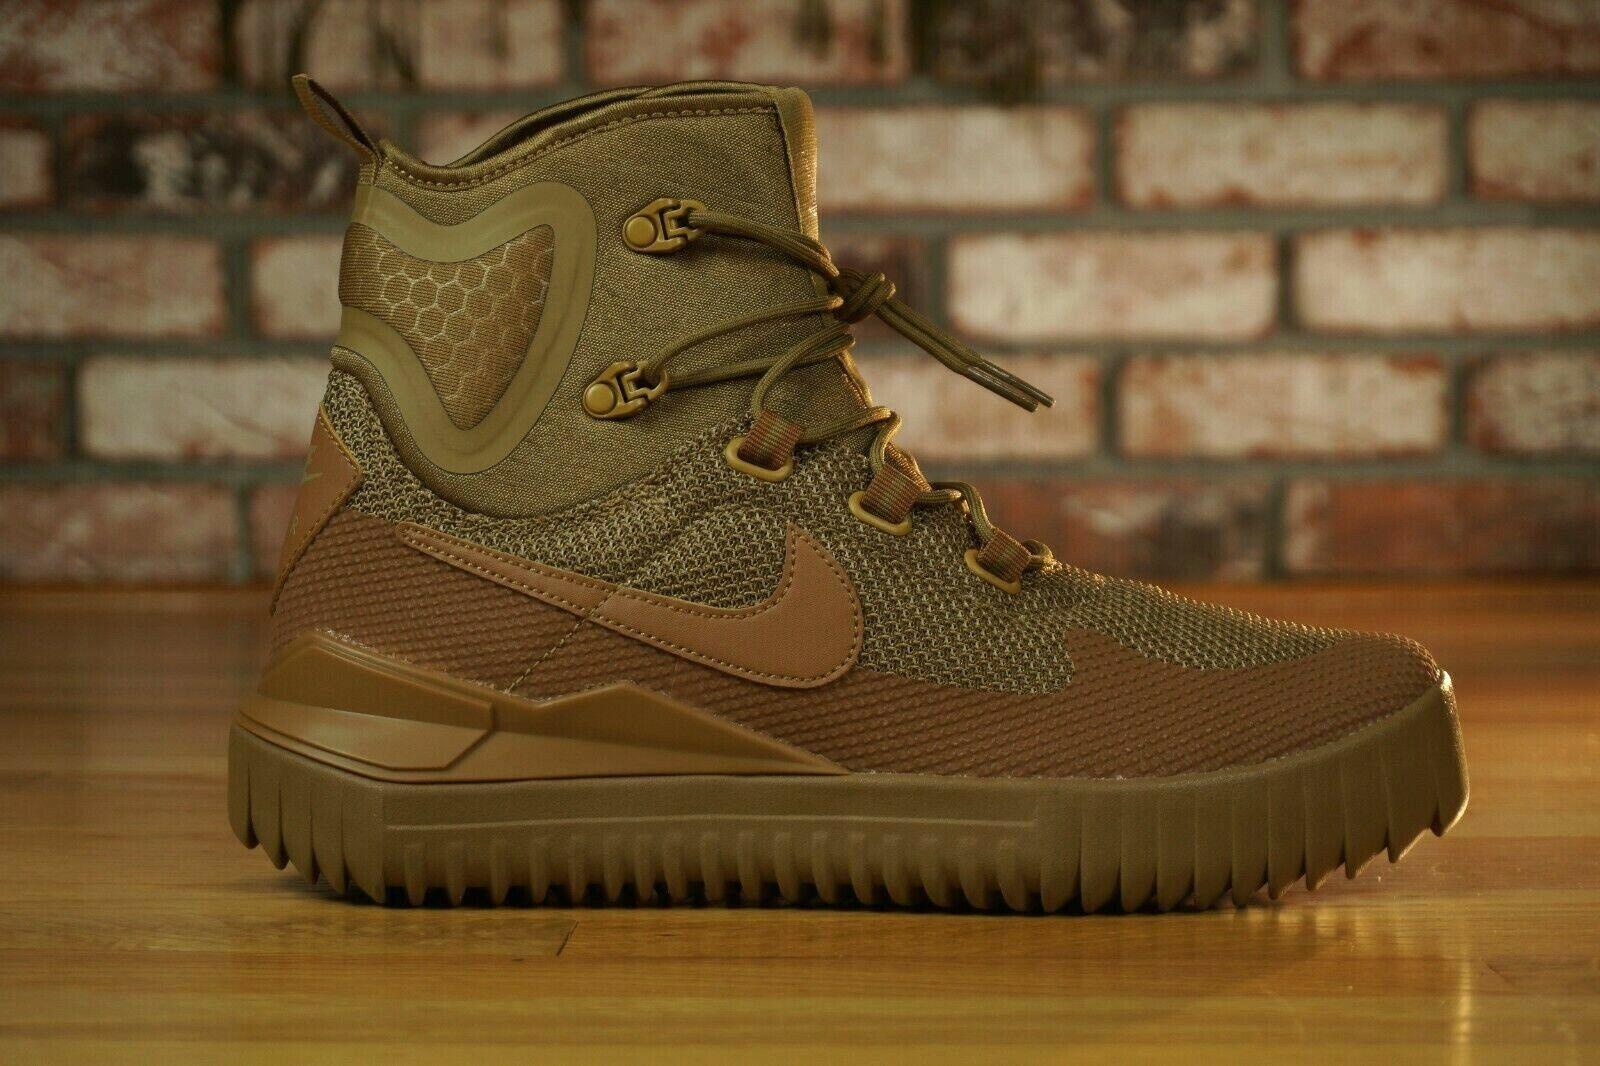 New Nike Air Wild Mid golden Beige Ale Brown 916819-200 Men's Size 8.5